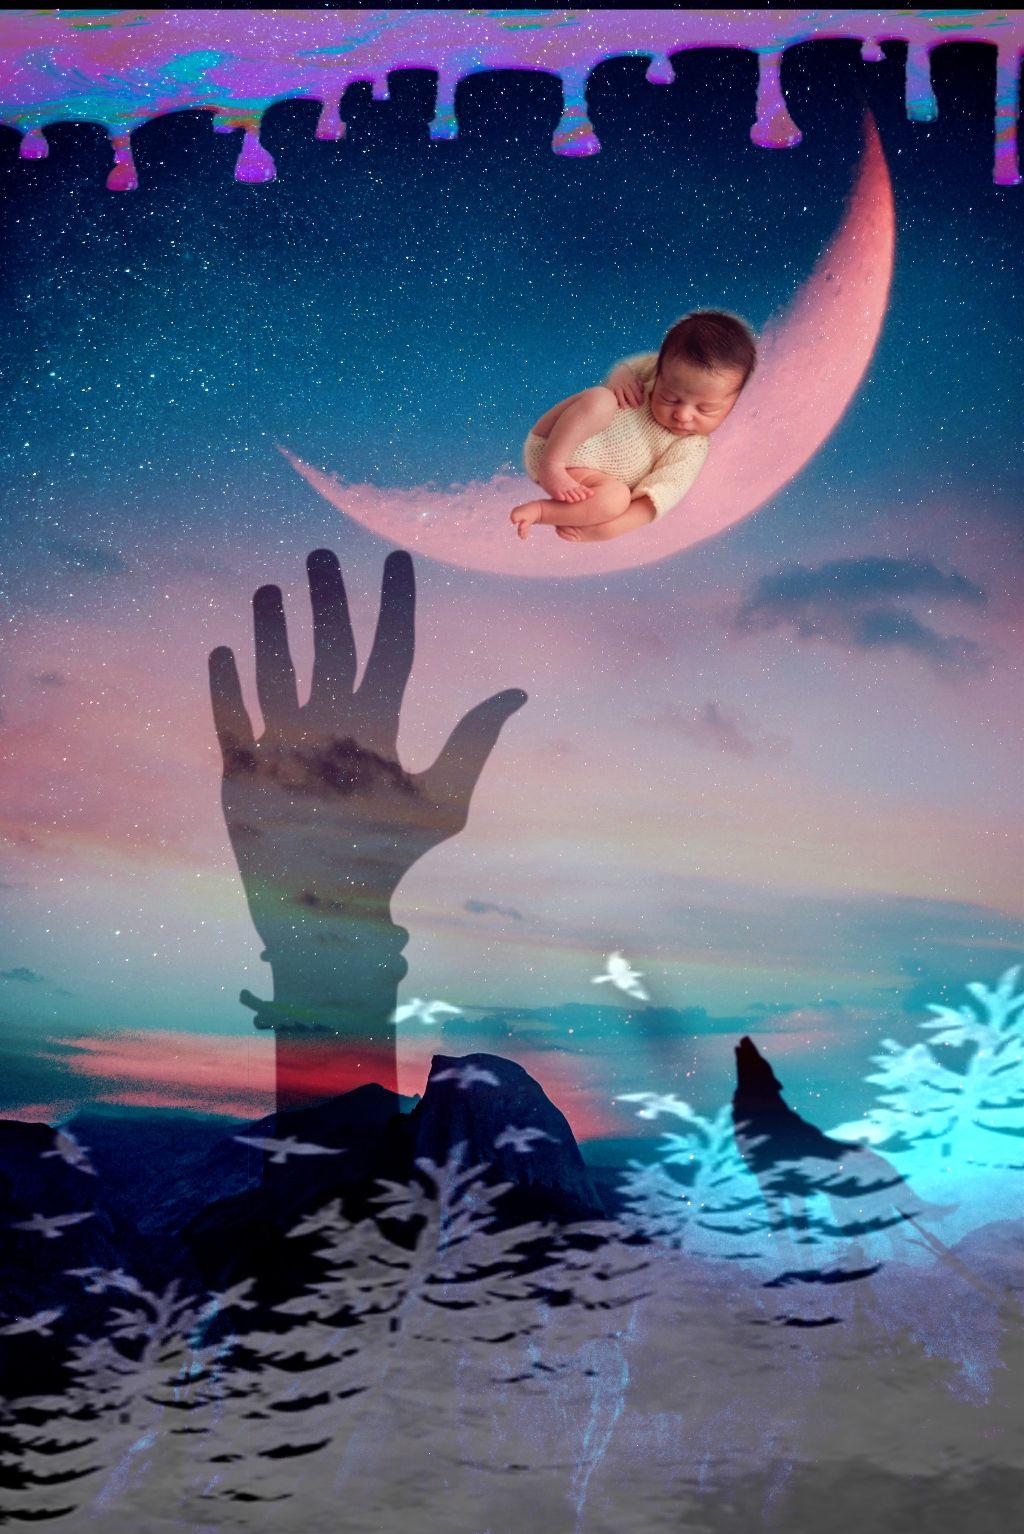 #freetoedit #doubleexposure #baby #sleeping #fantasy #curvetool #picsarteffects